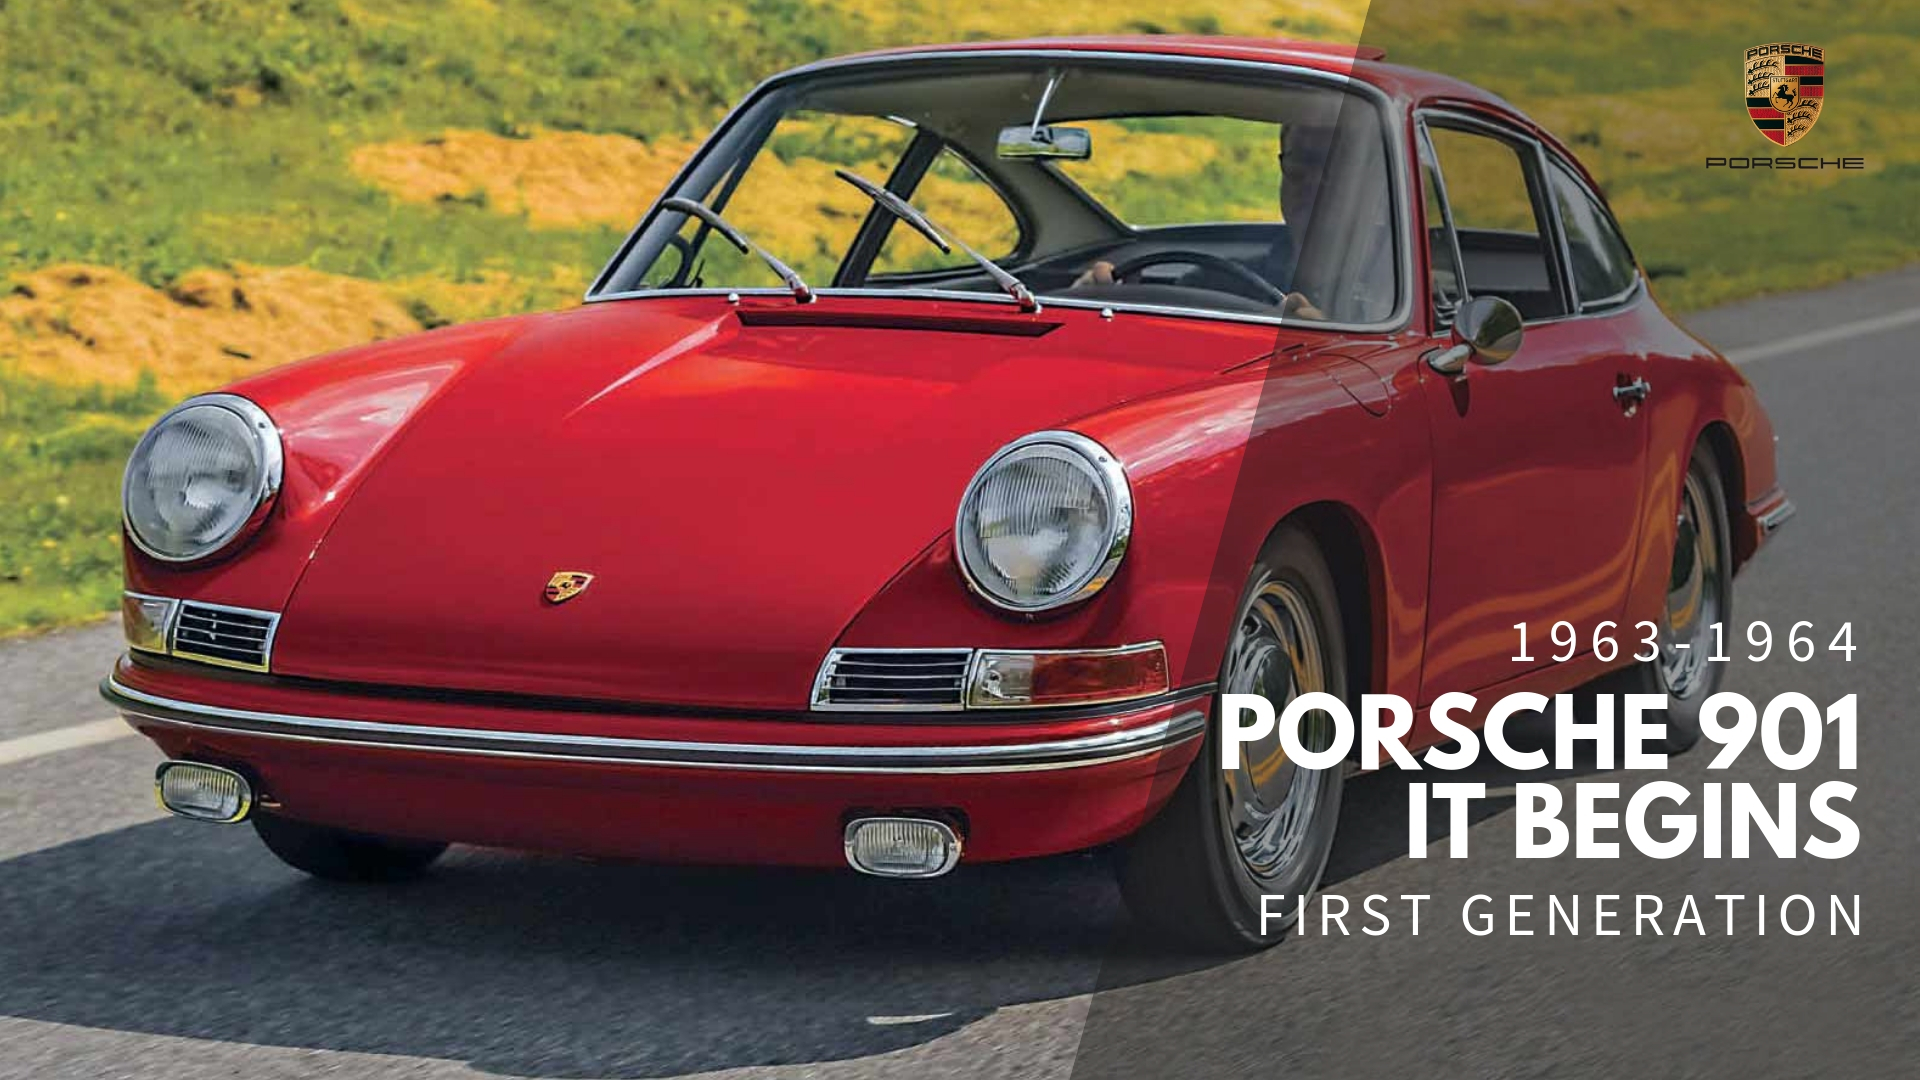 Porsche 901 - The Original (1963-1964)